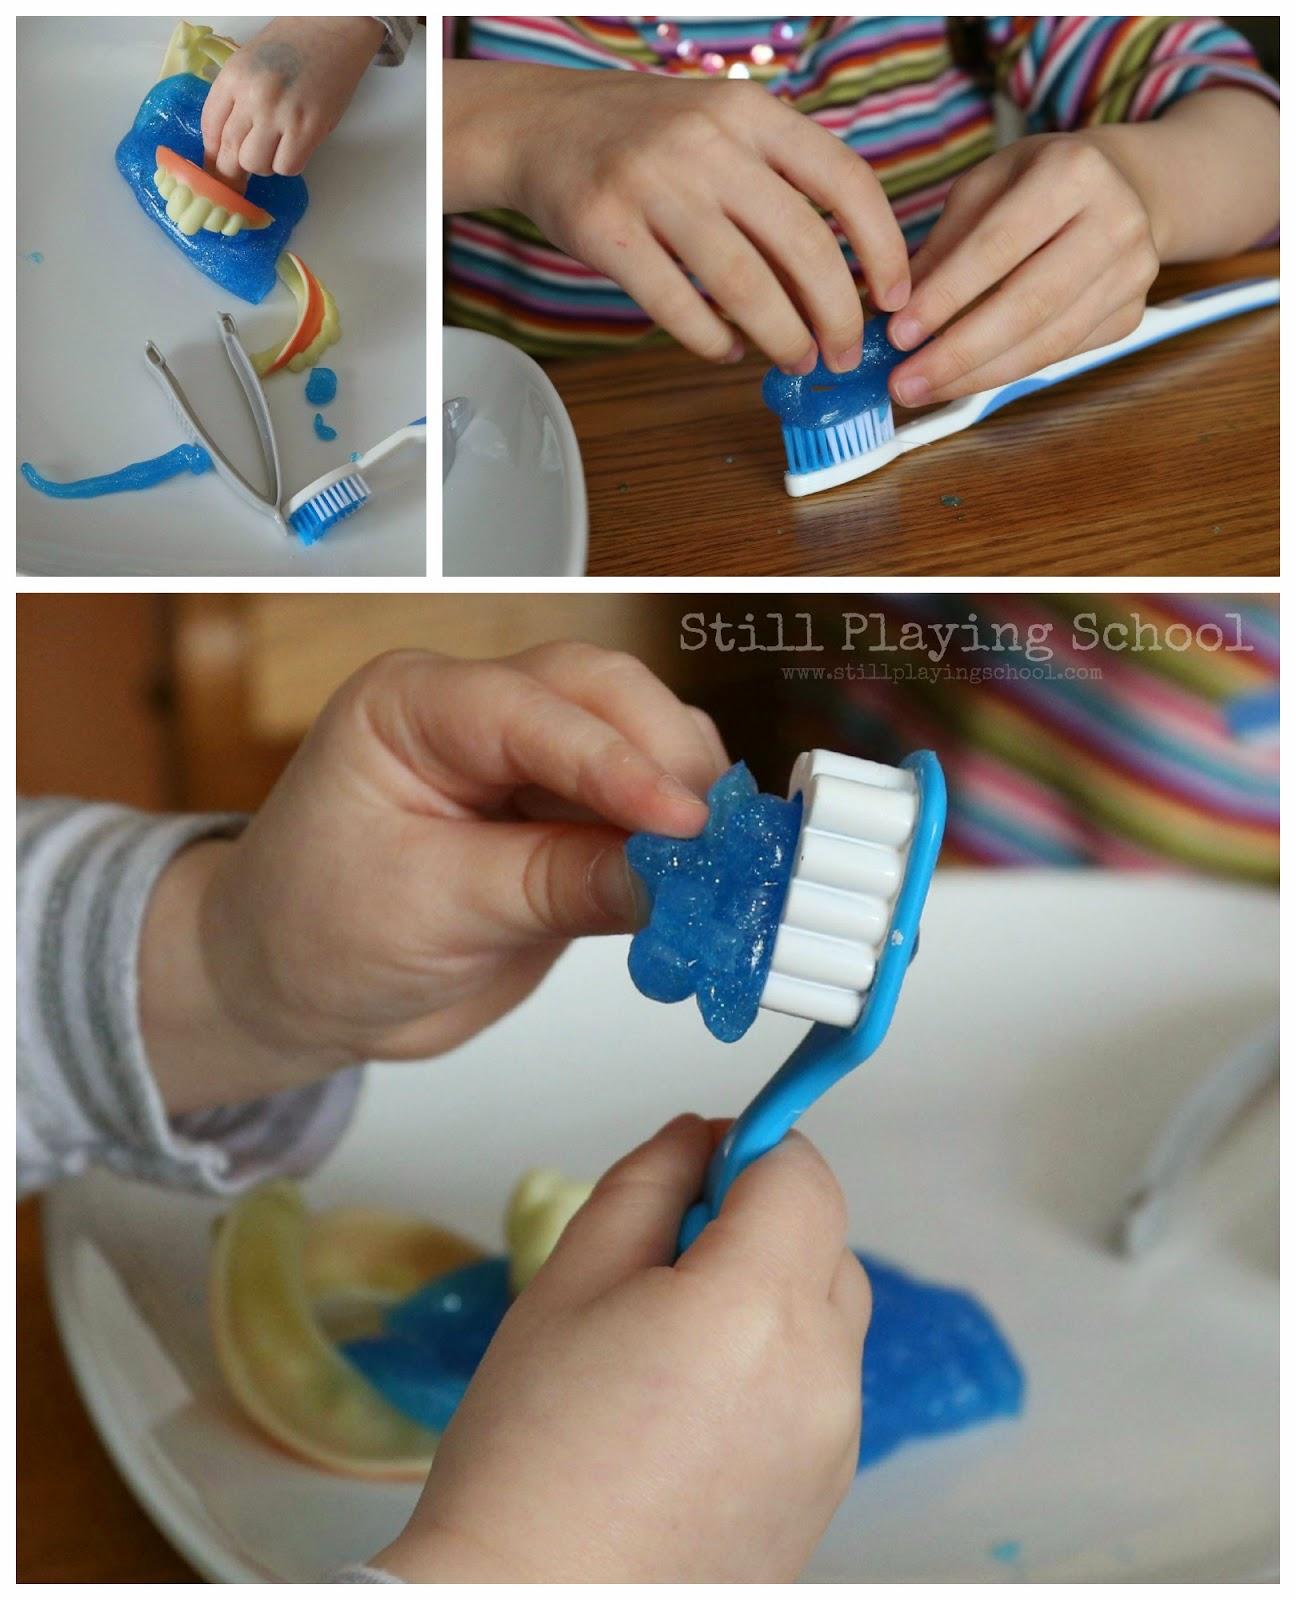 Slime With Toothpaste : slime, toothpaste, Toothpaste, Slime, Dental, Health, Month, Still, Playing, School